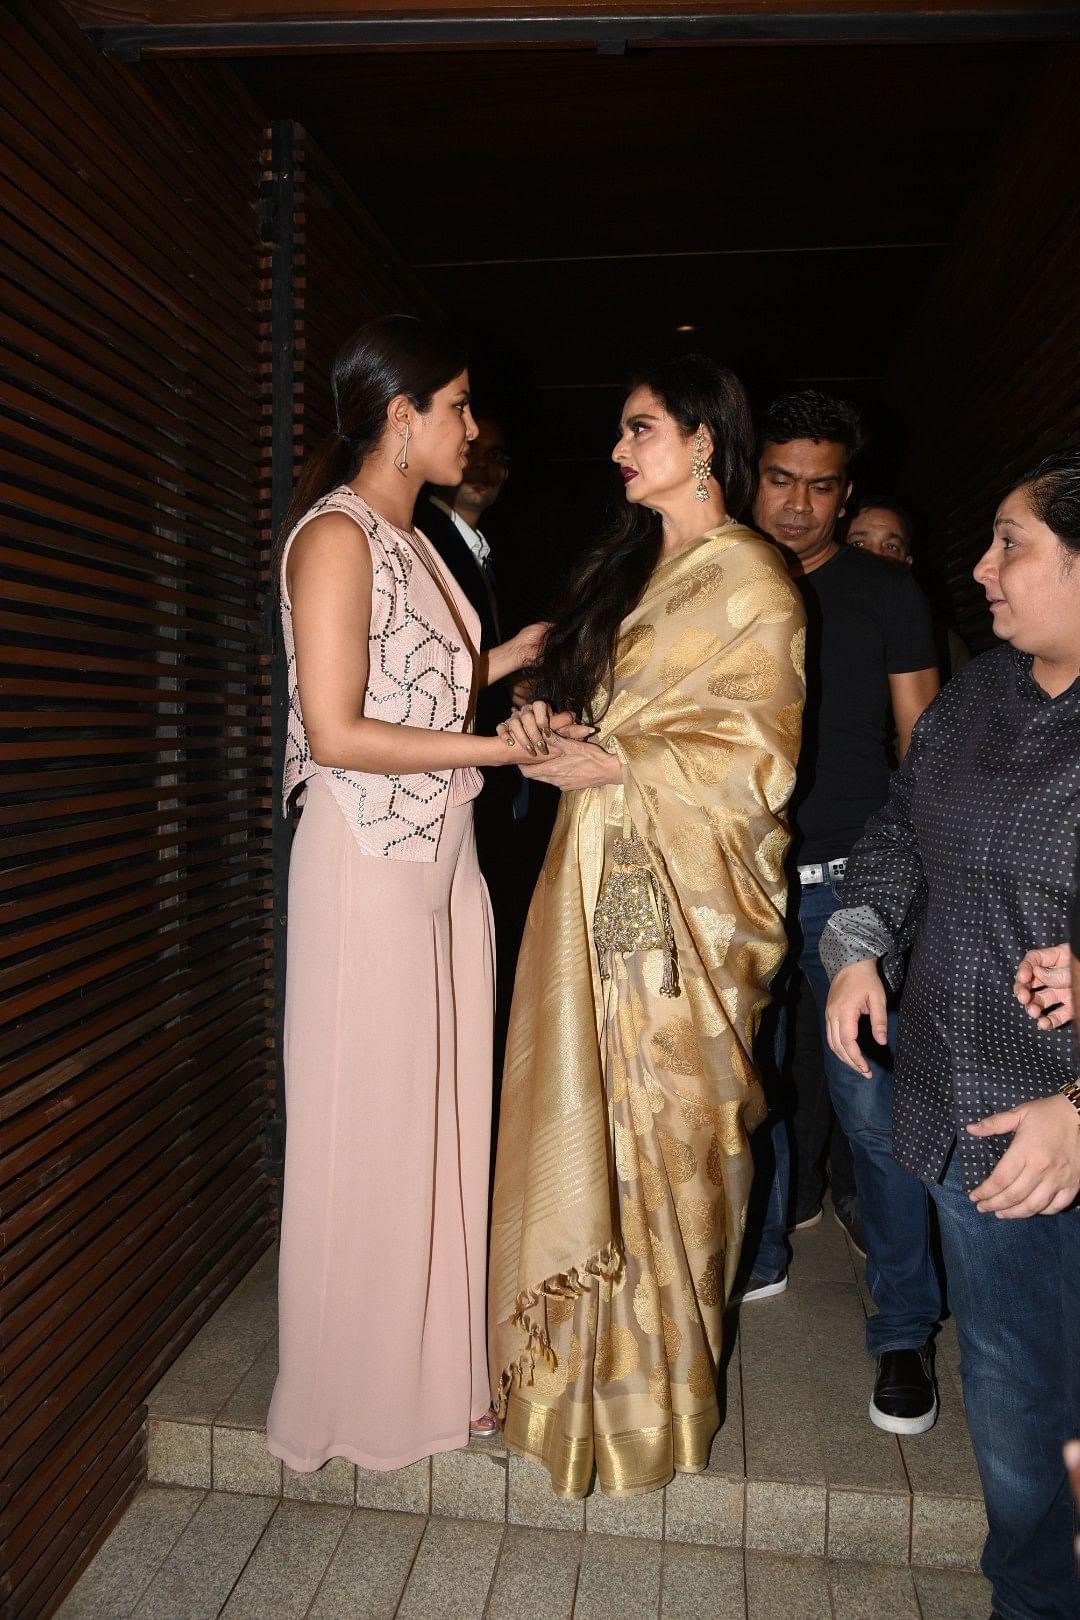 Priyanka and Rekha wrapped up in conversation. (Photo: Yogen Shah)